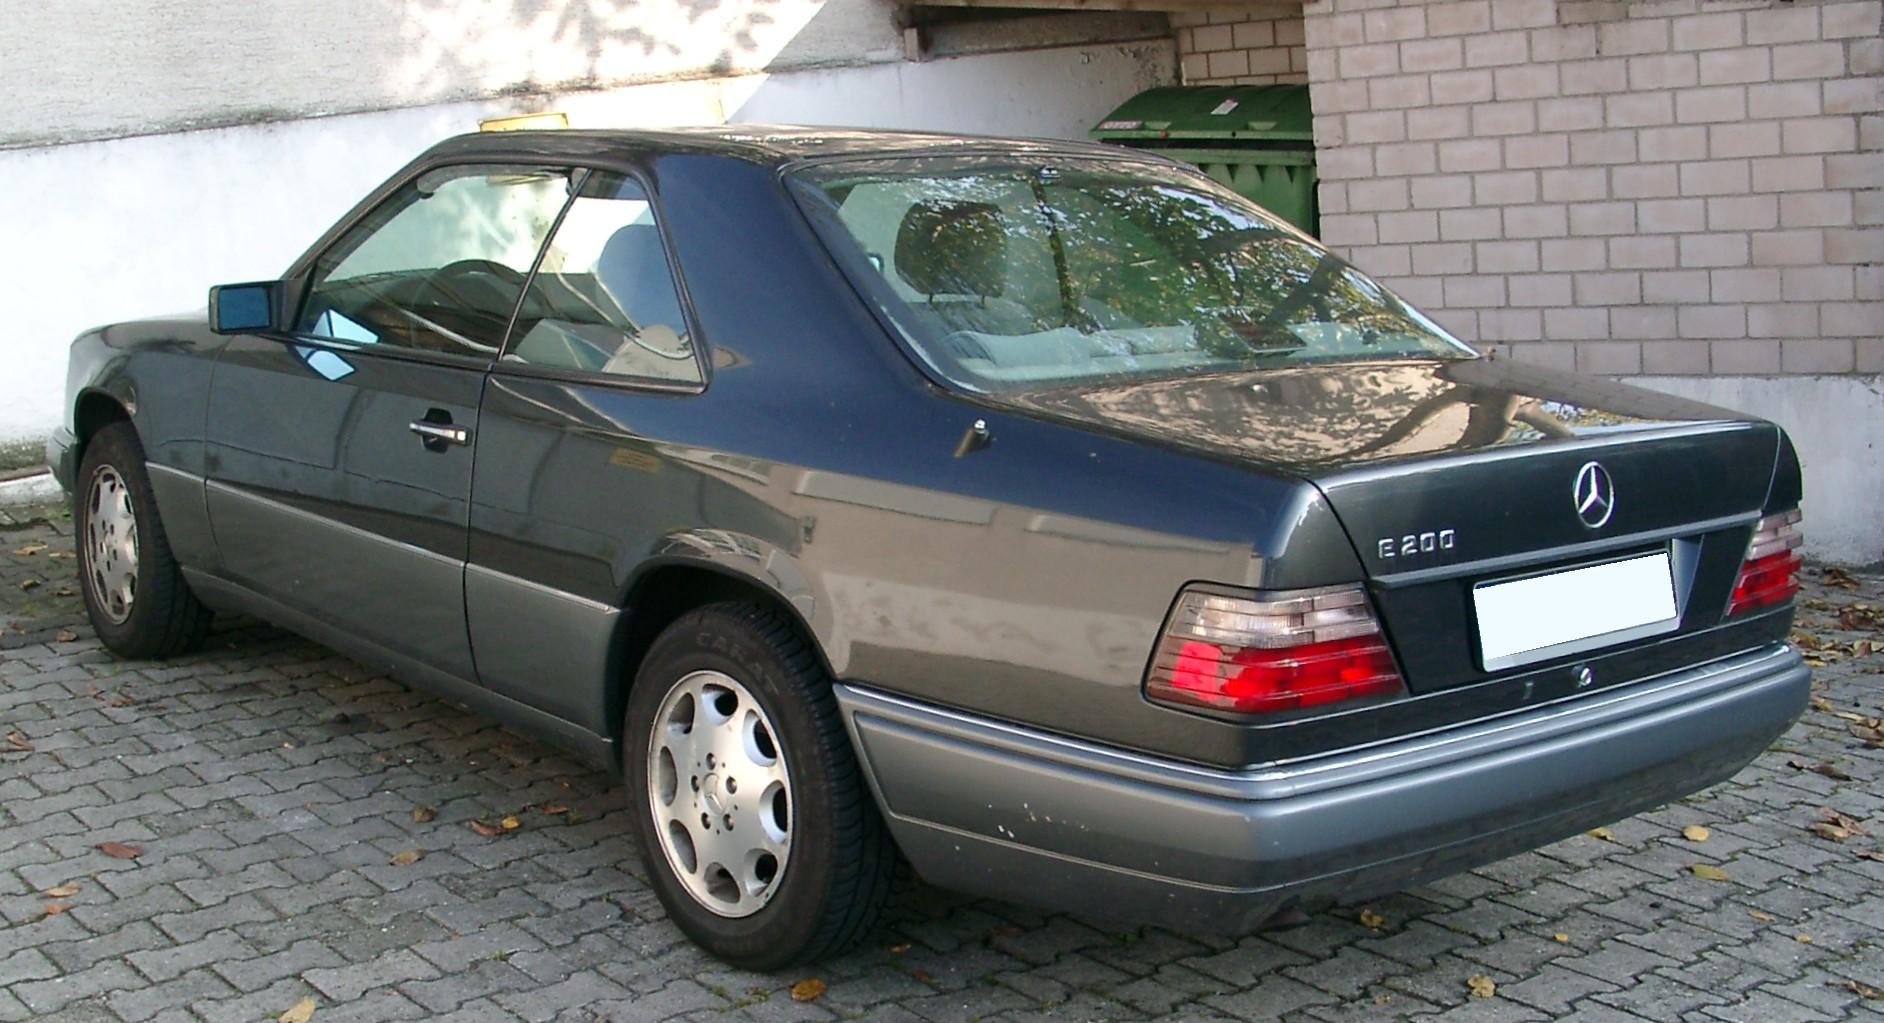 Mercedes-Benz E-klasse AMG I (W124) 1993 - 1996 Coupe-Hardtop #5